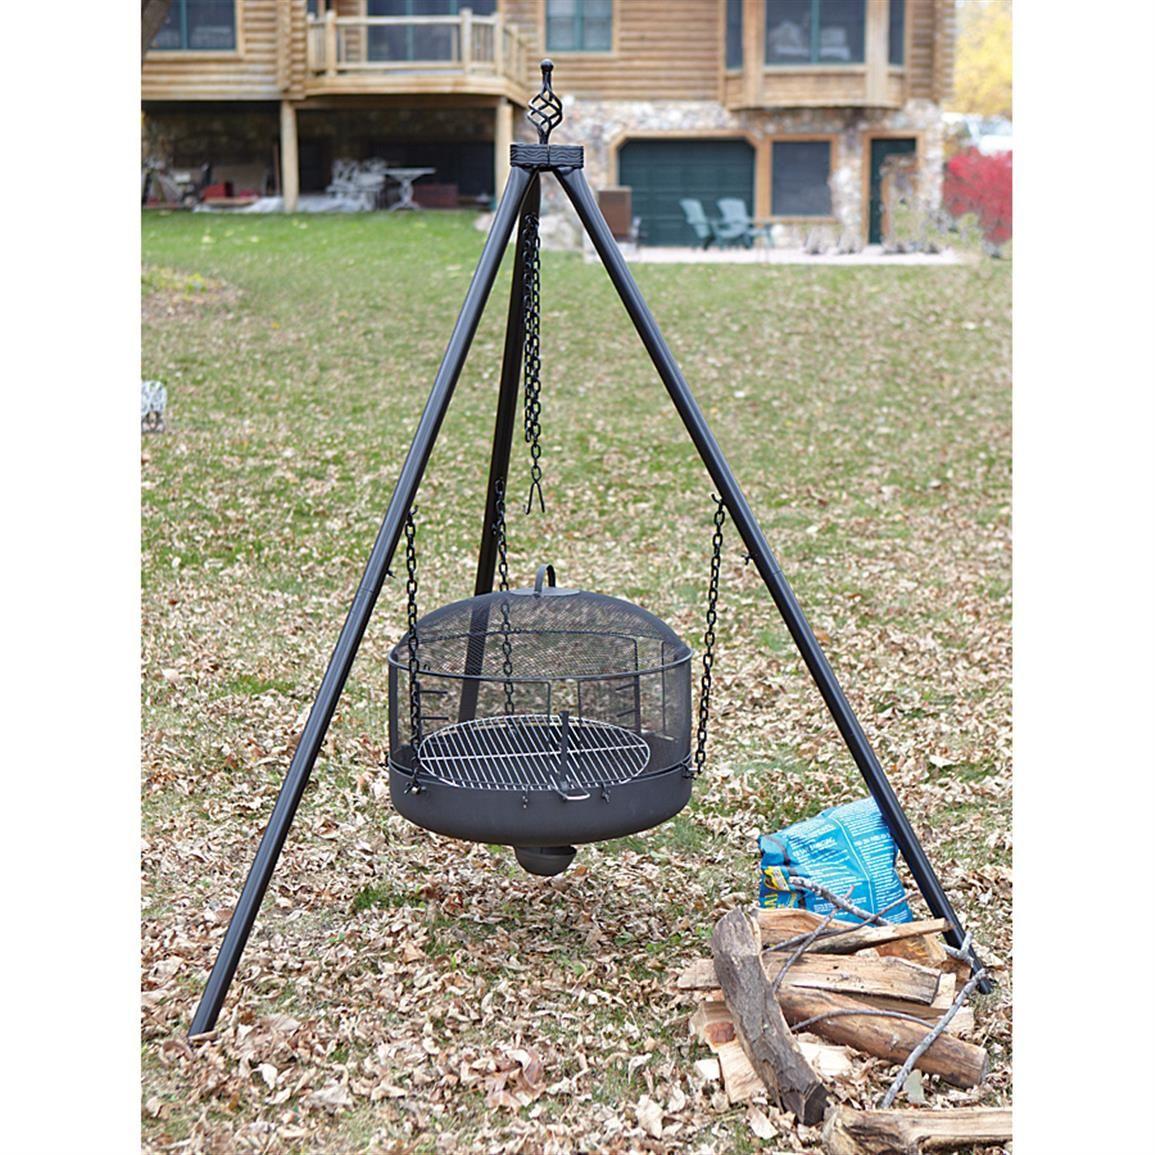 Campfire Tripod /& Fire Disc Set Heavy Duty CAMPING Pro BUSHCRAFT